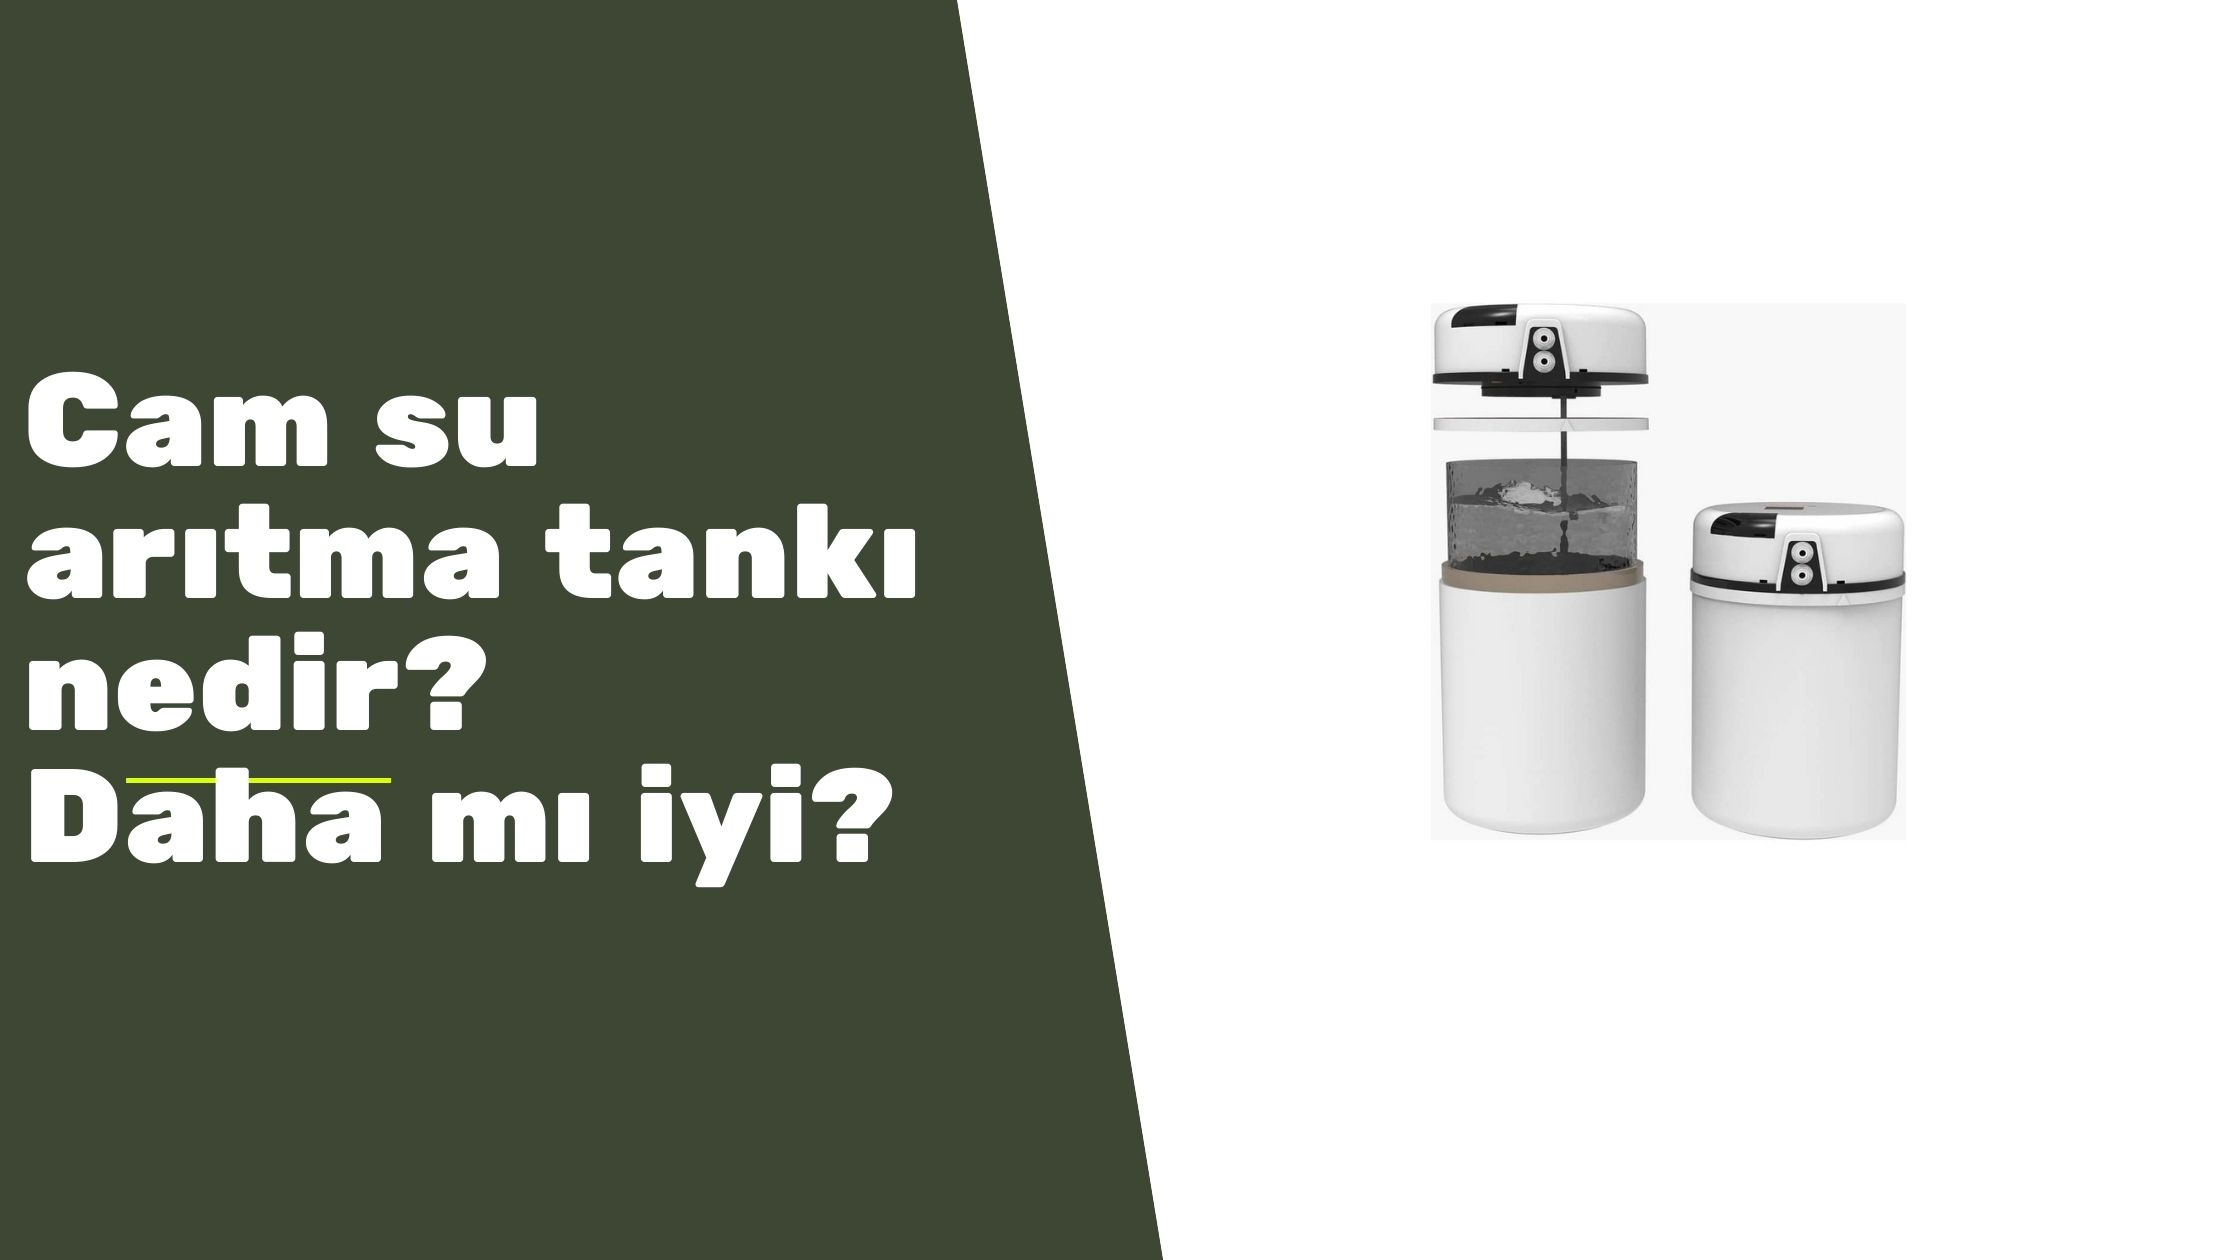 Cam su arıtma tankı daha mı iyi? Farkı nedir?